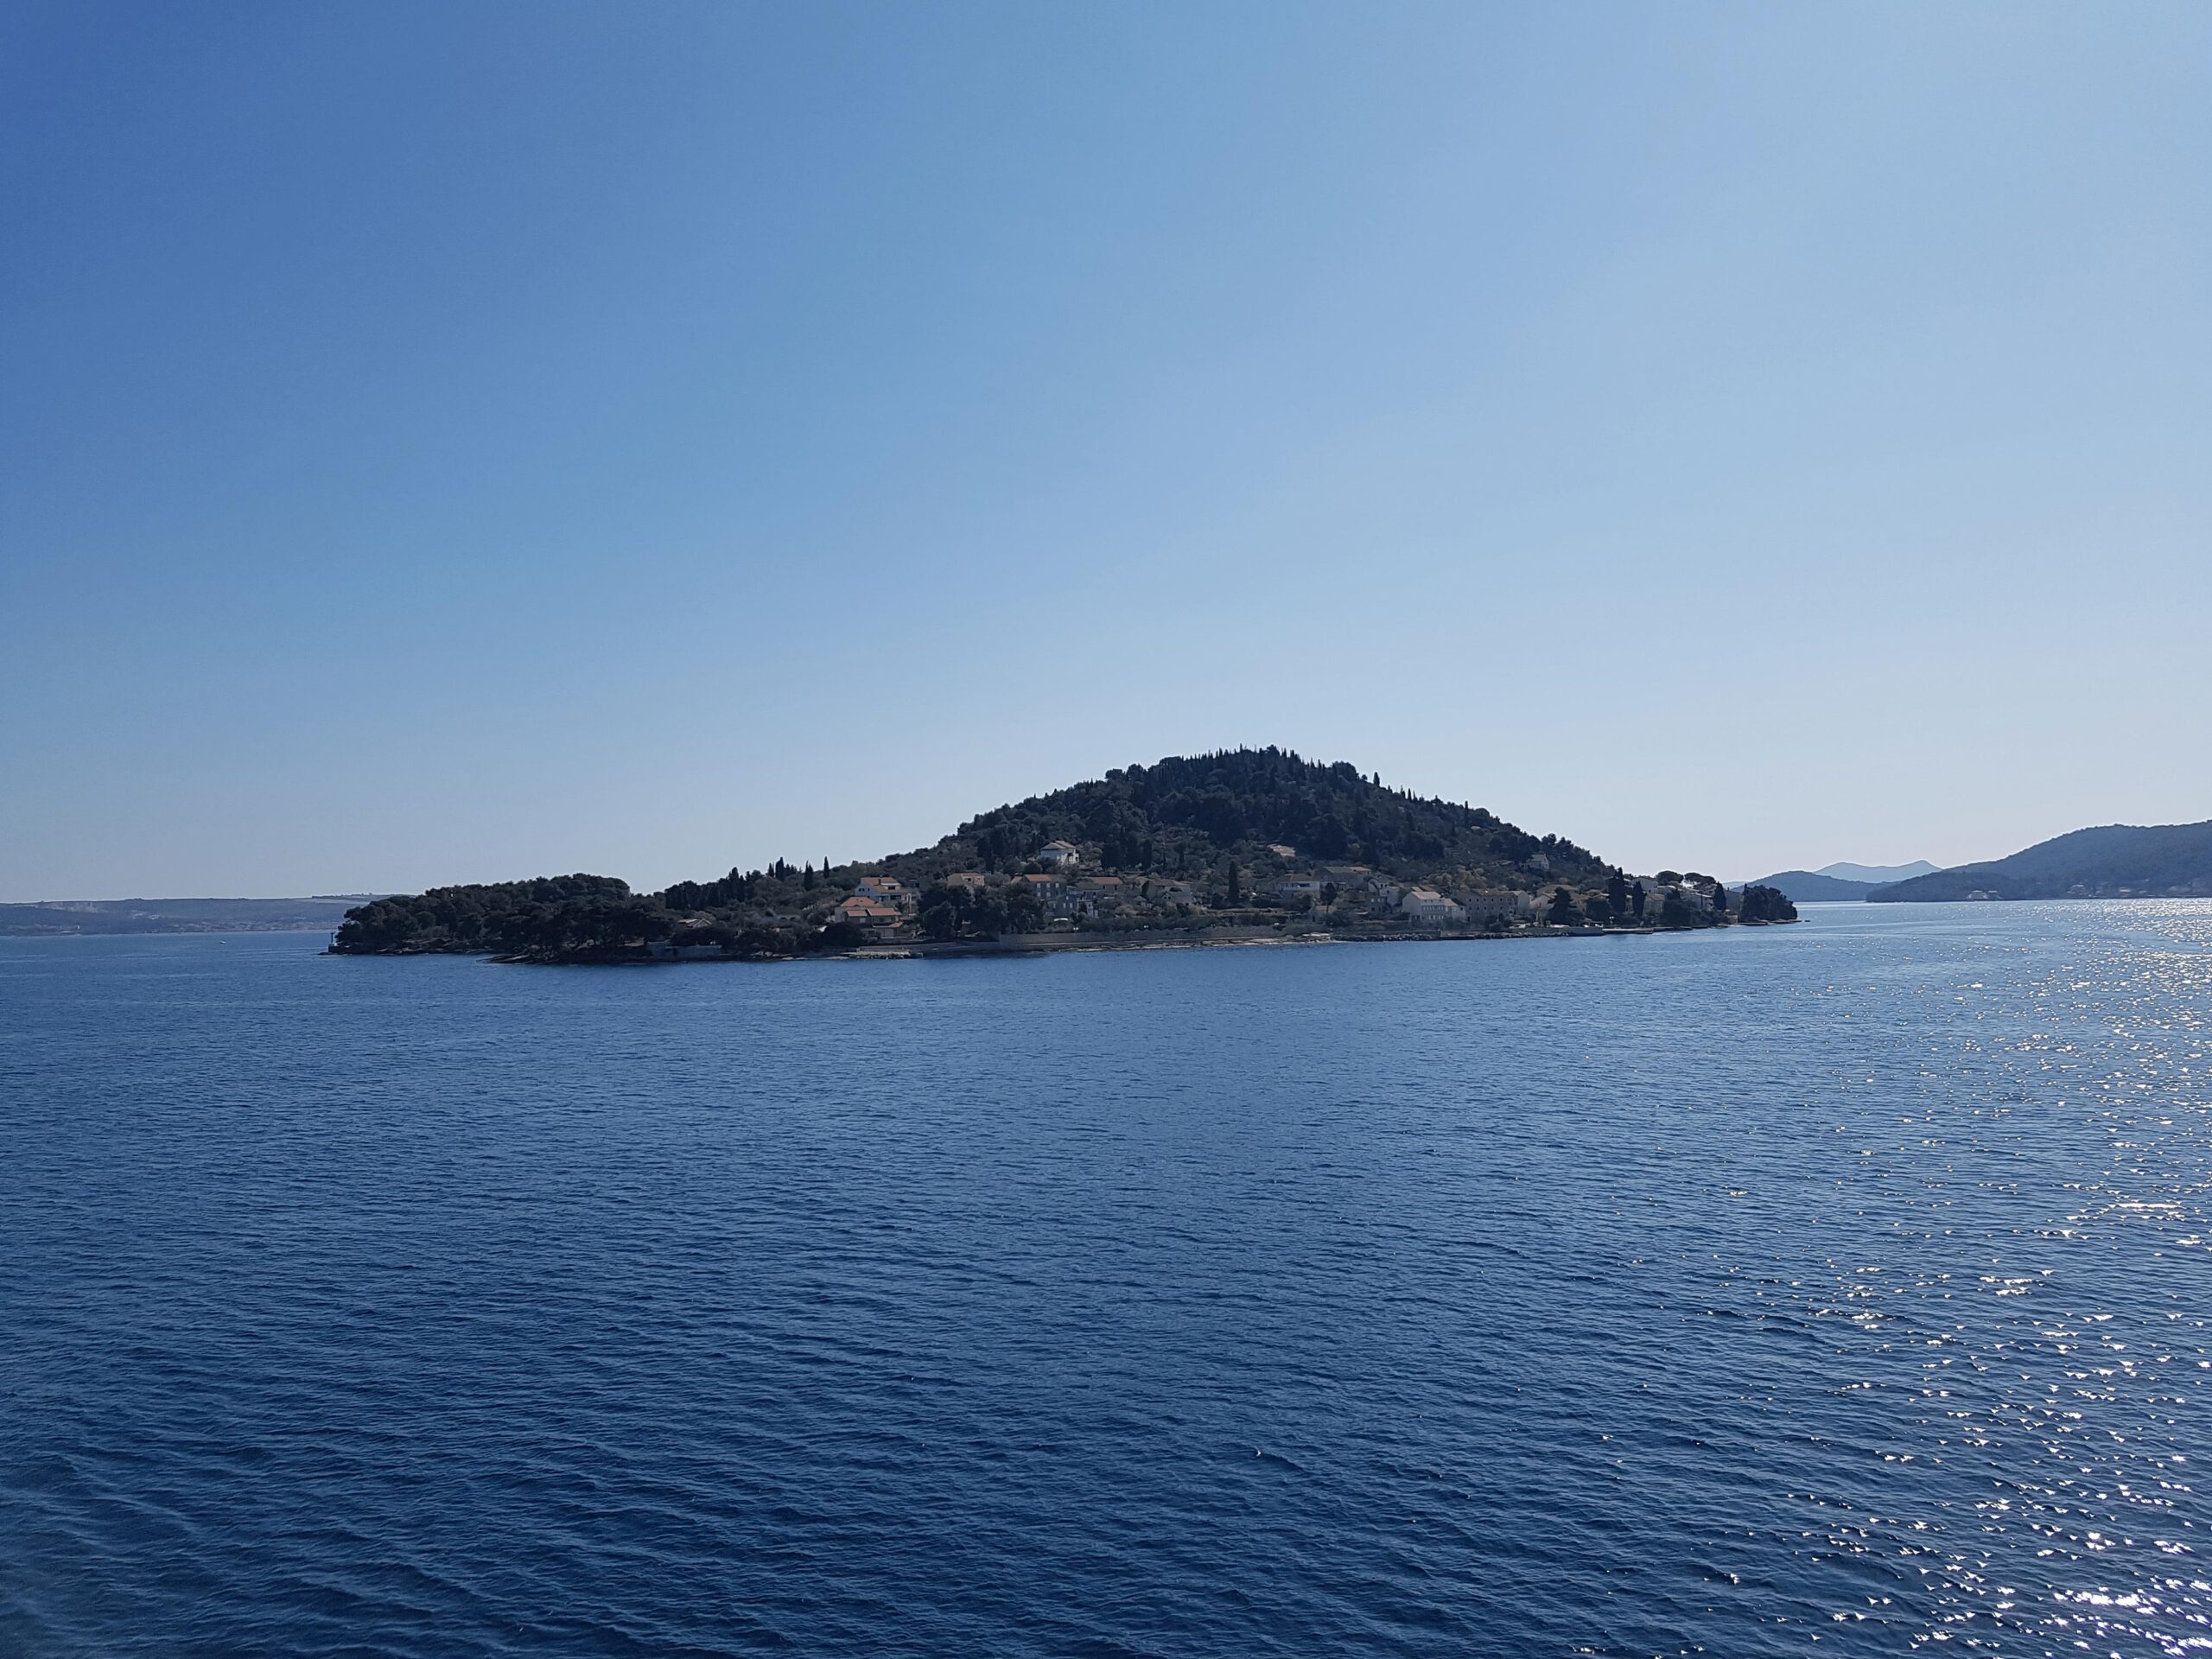 Osljak island